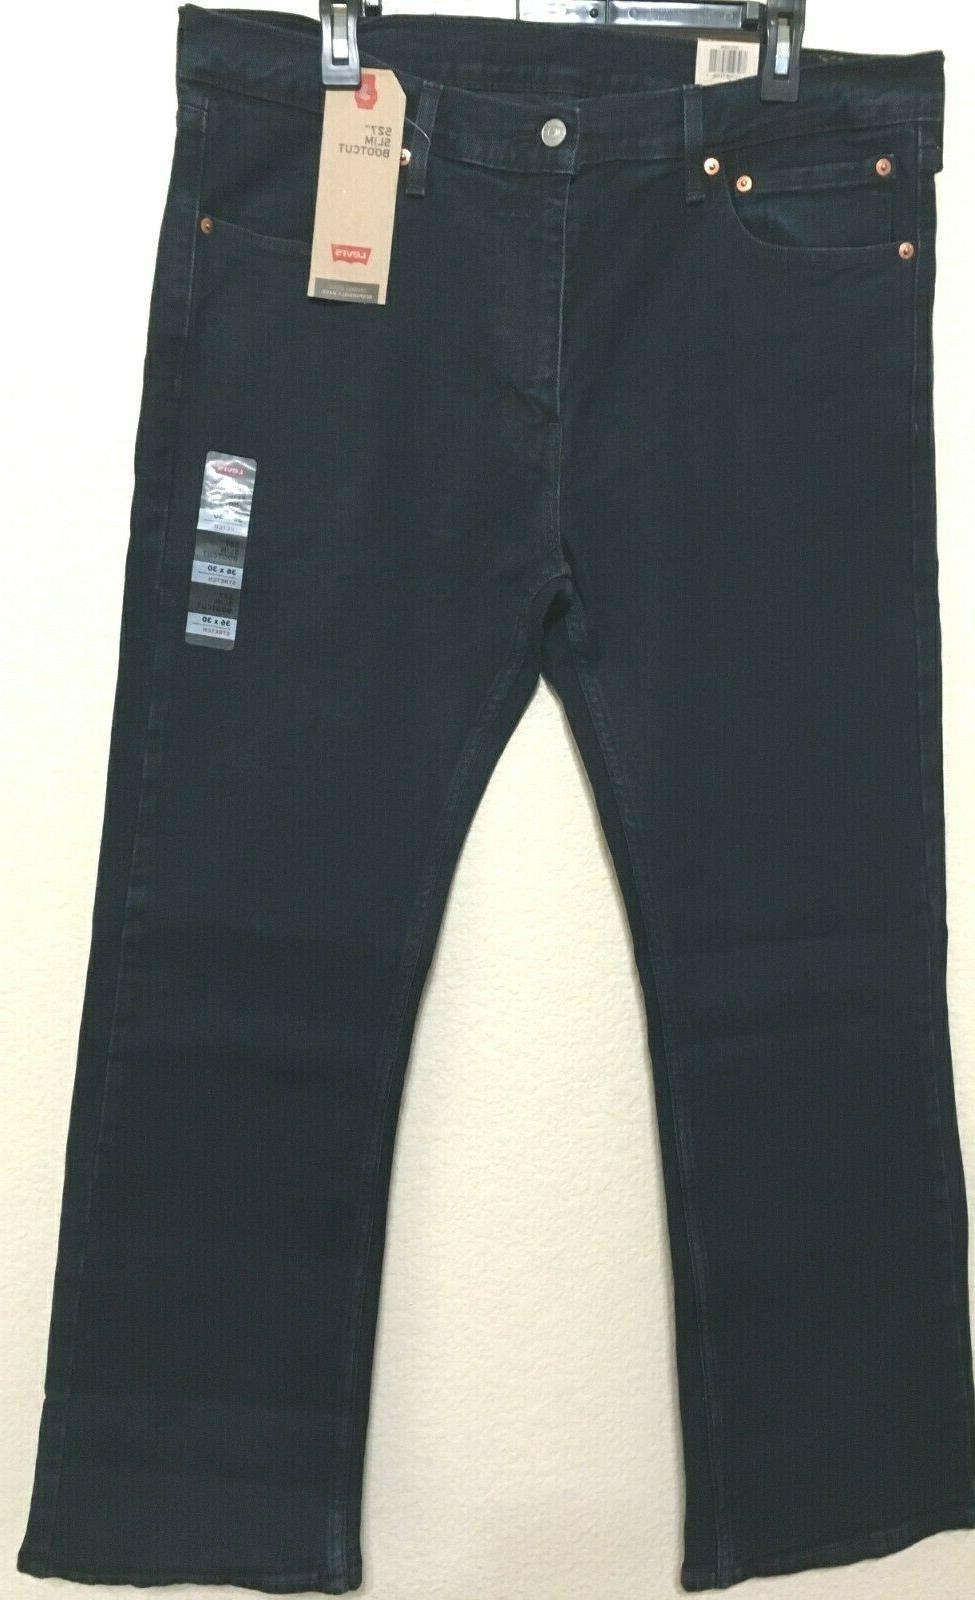 NWT 527 - 0598 STRETCH JEANS DARK BLUE PANT